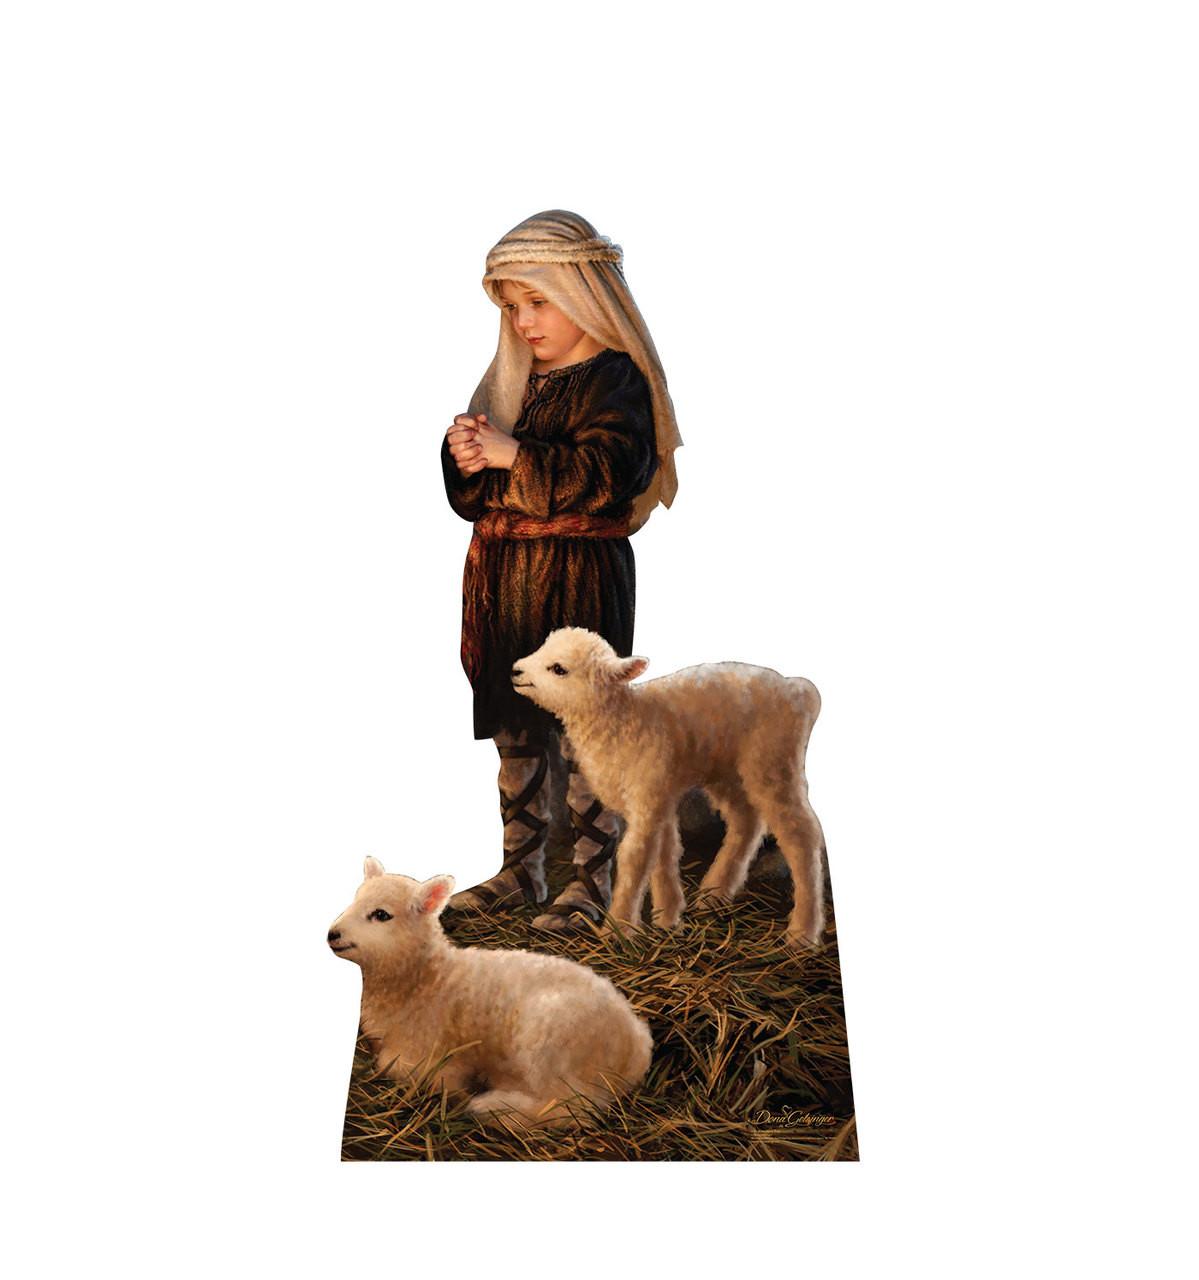 Life-size Shepherd Boy - Illustrated by Dona Gelsinger Cardboard Standup